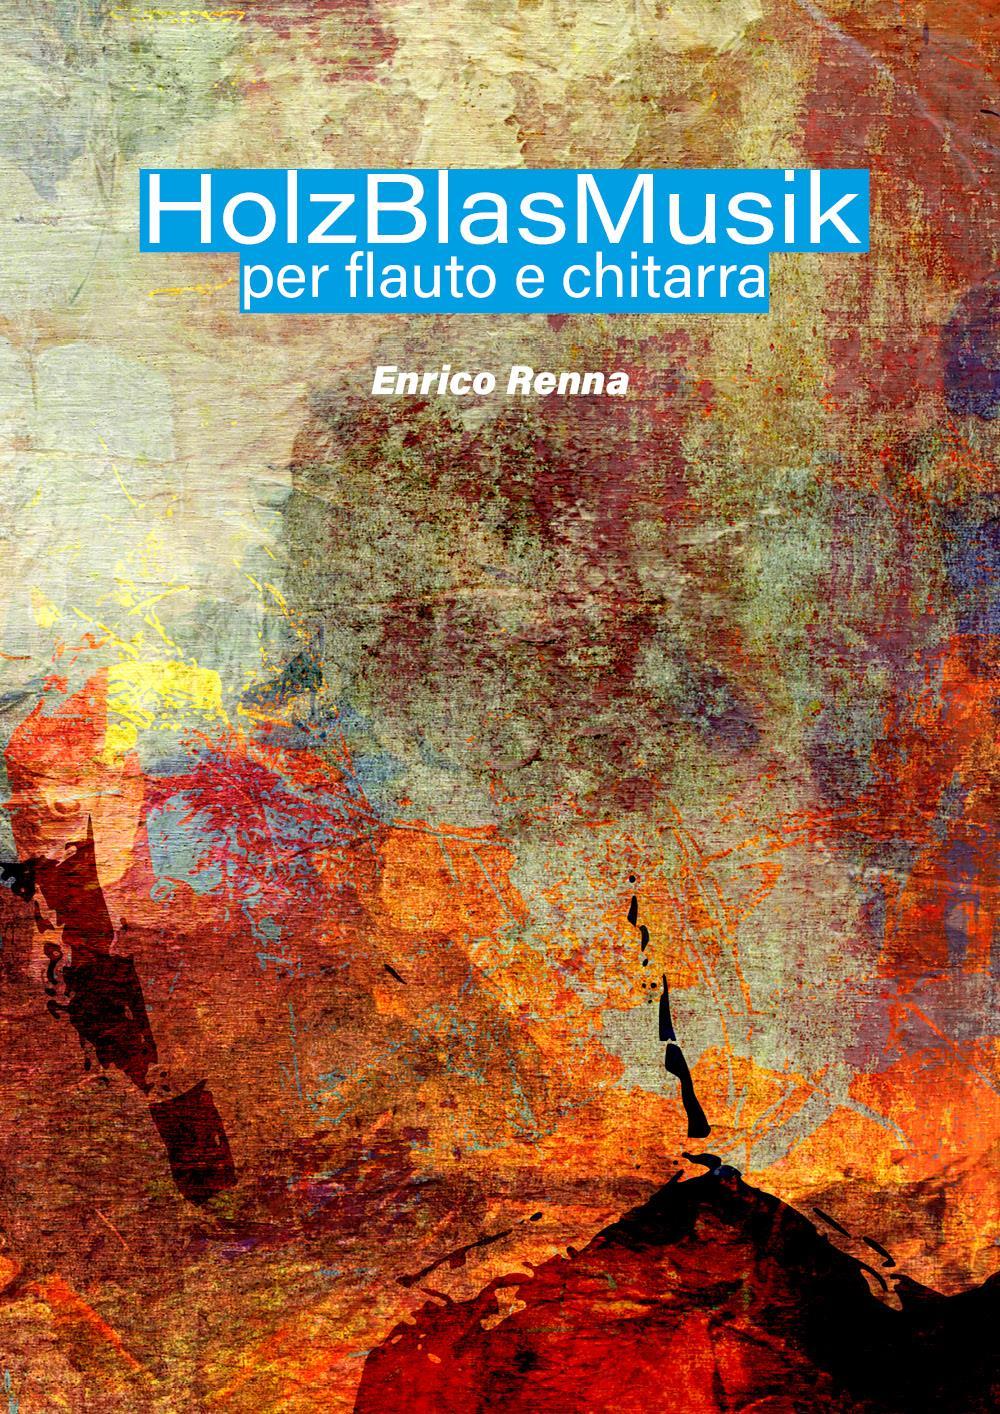 HolzBlasMusik per flauto e chitarra